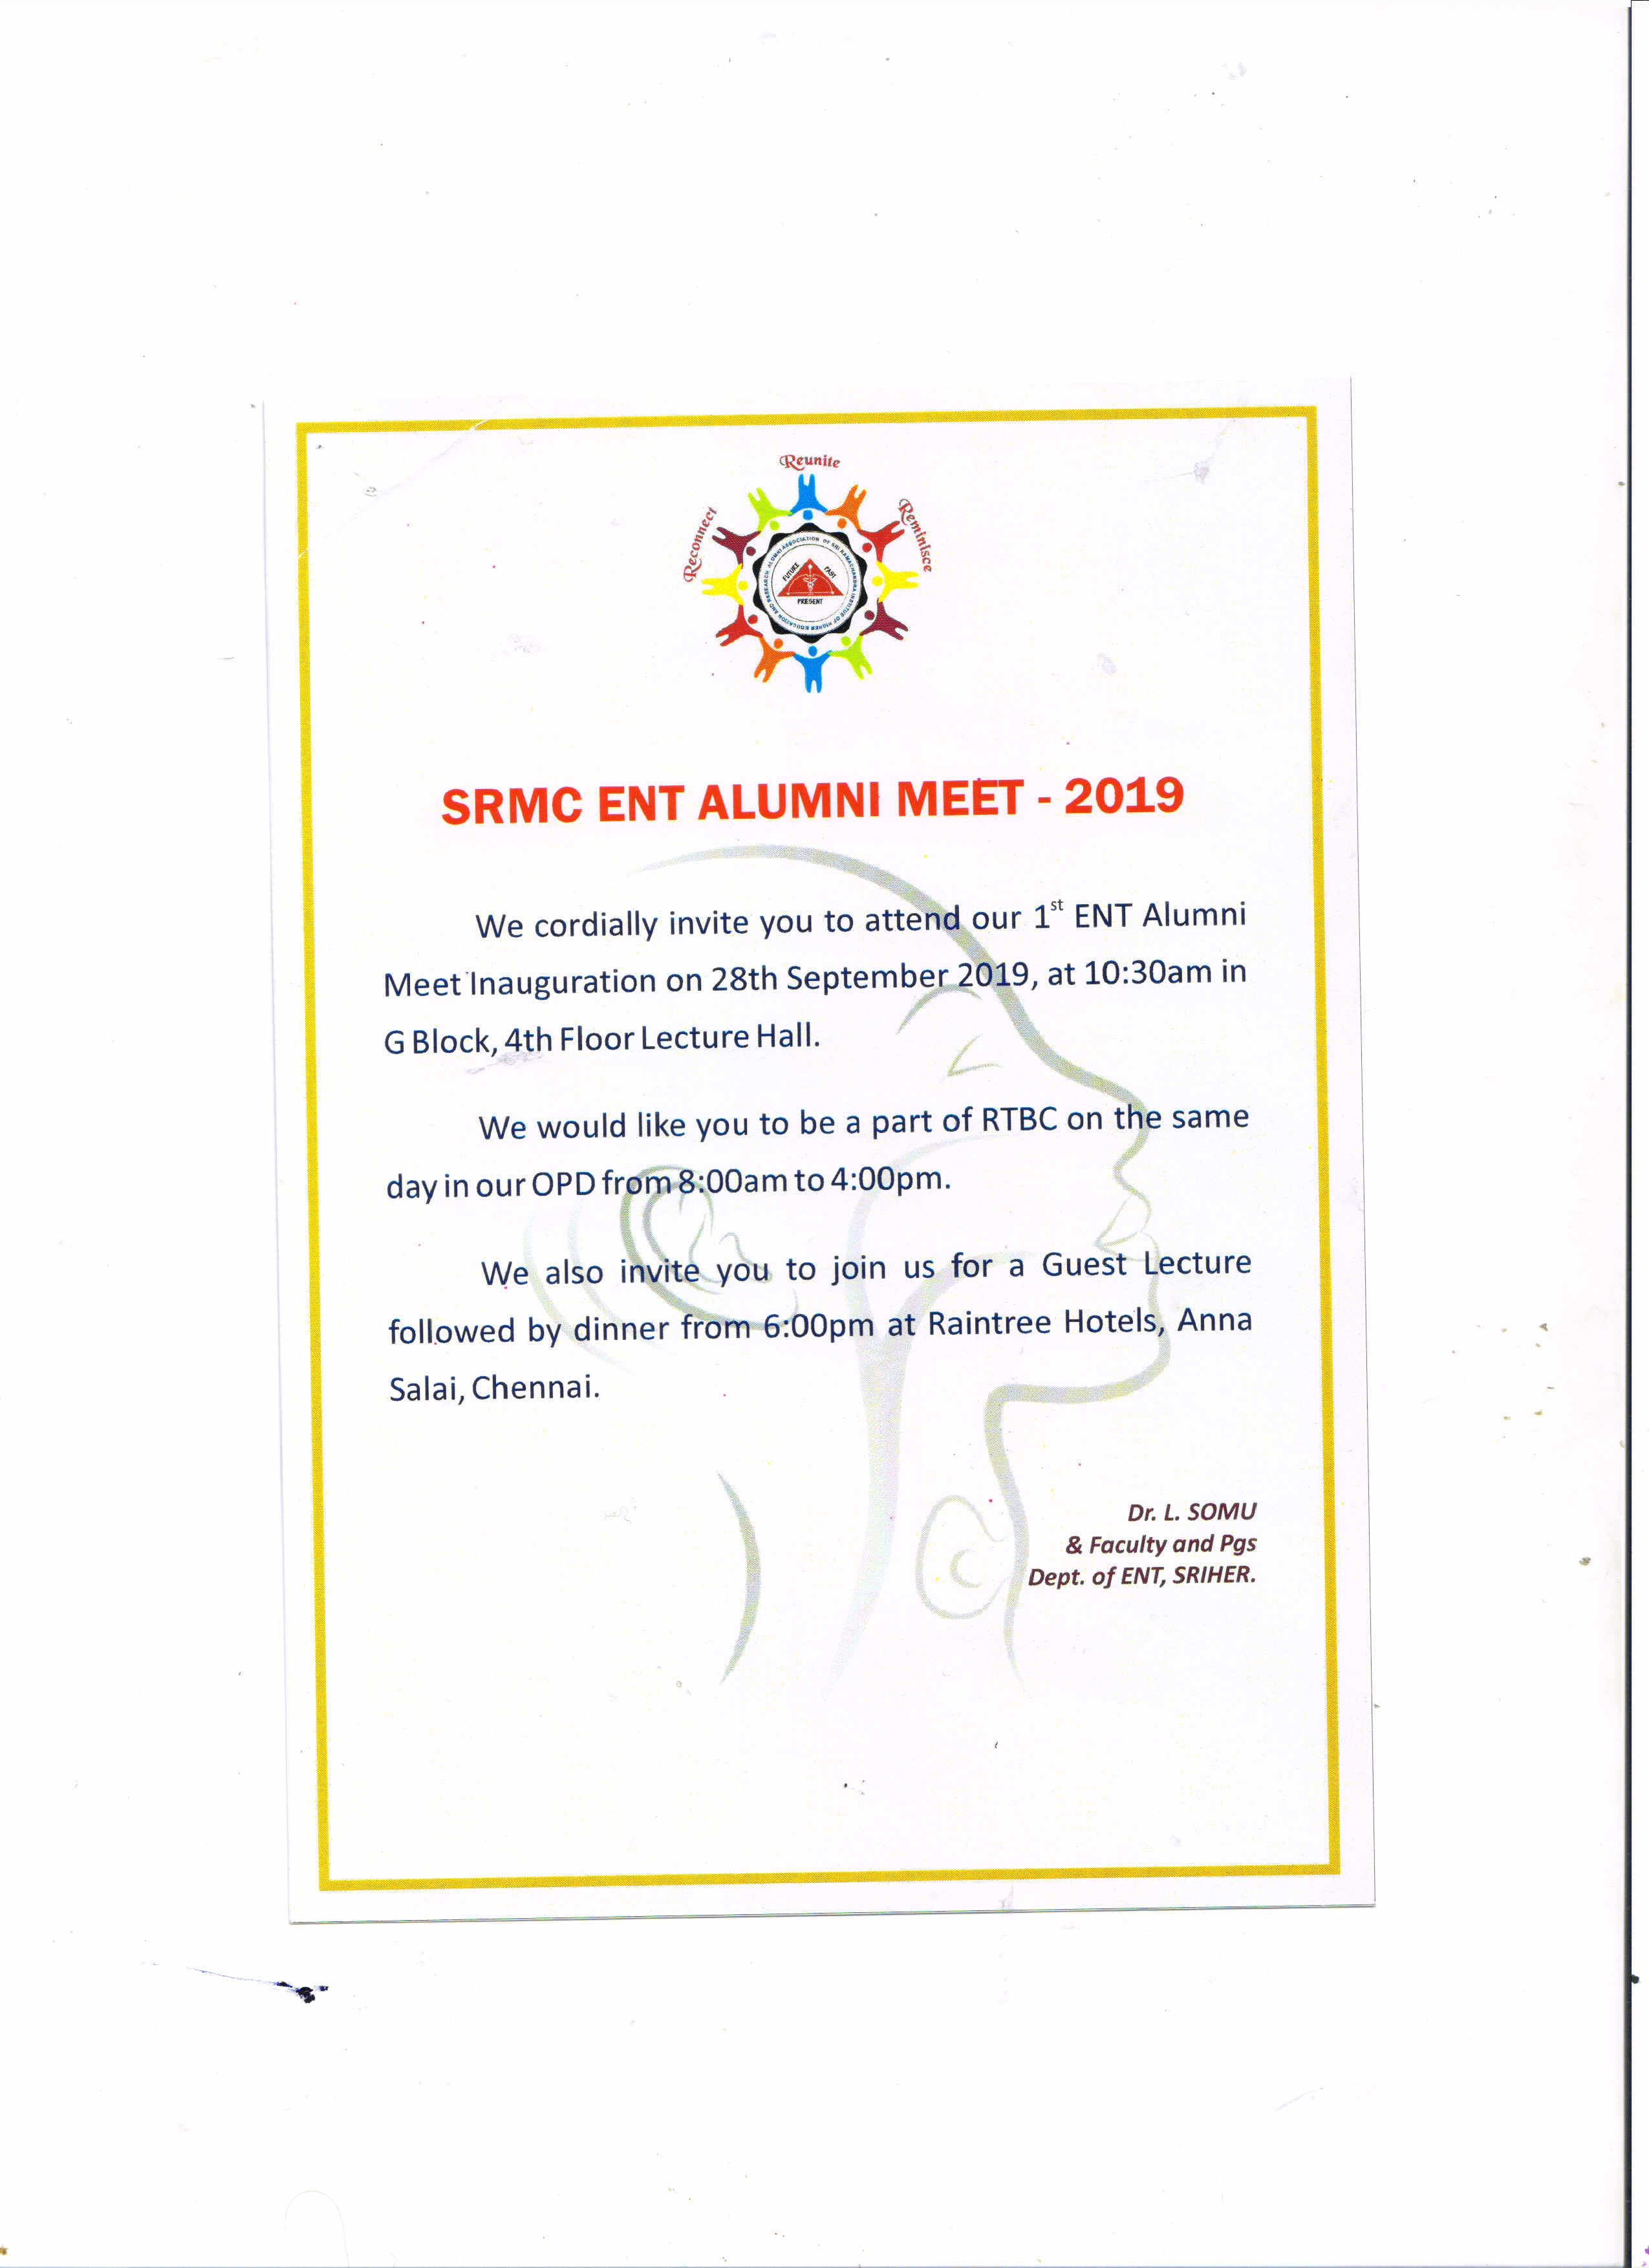 Alumni Association of Sri Ramachandra INstitute of Higher Education and Research - ENT Alumni Meet - 2019